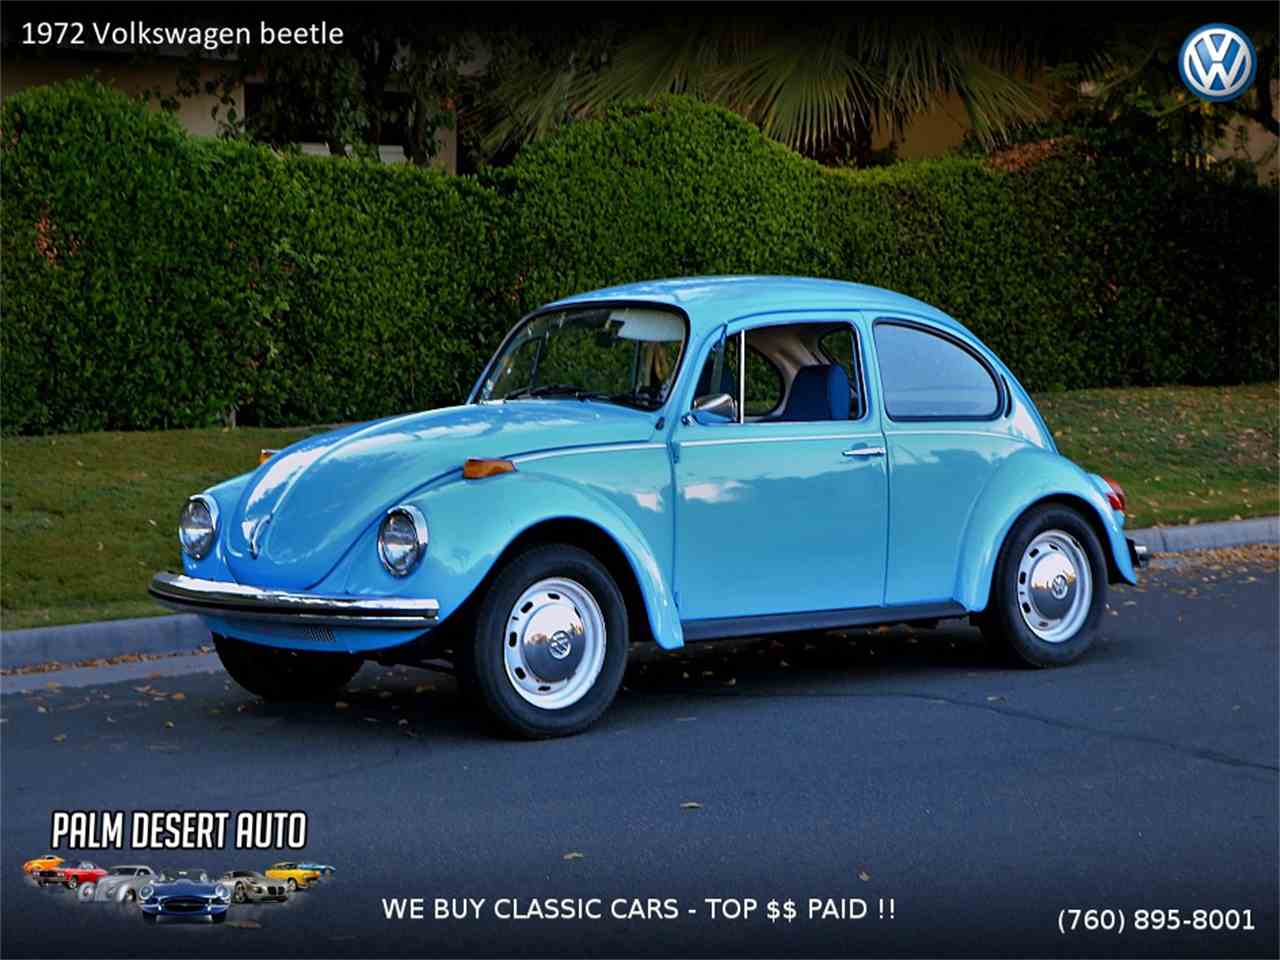 1972 Volkswagen Beetle for Sale | ClassicCars.com | CC-1058181